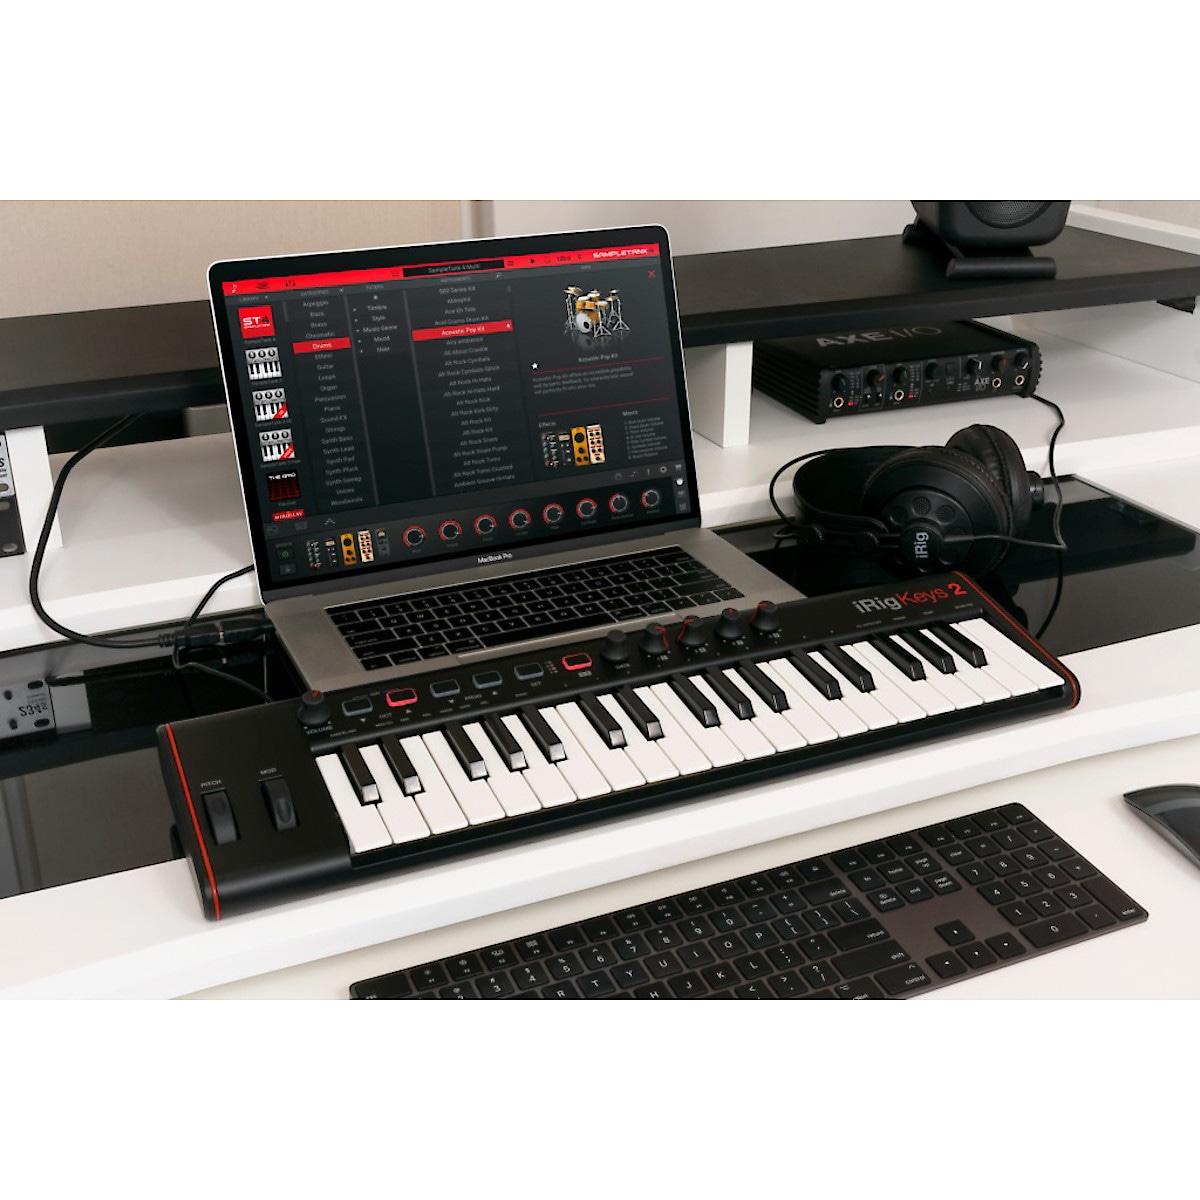 IK Multimedia iRig Keys 2 MIDI keyboard controller